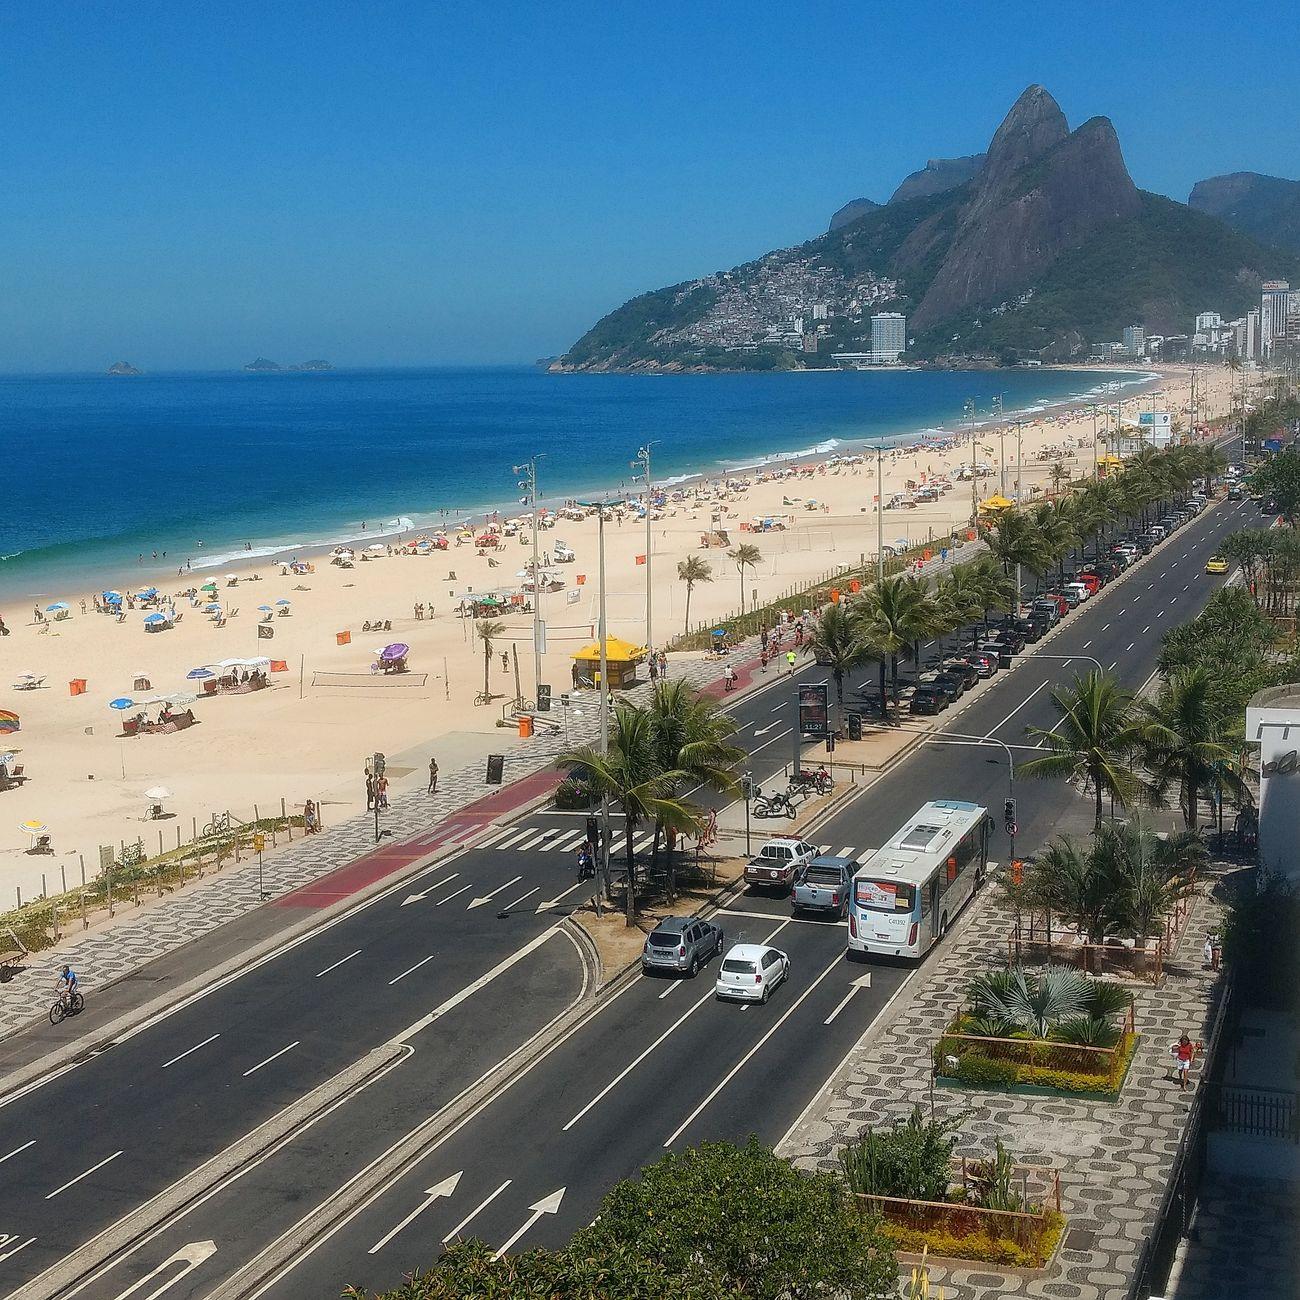 Ipanema Beach Rio De Janeiro Eyeem Fotos Collection⛵ Riodejaneiro Outdoors Rio De Janeiro, Brazil Sky Beach Photography Stree Photography